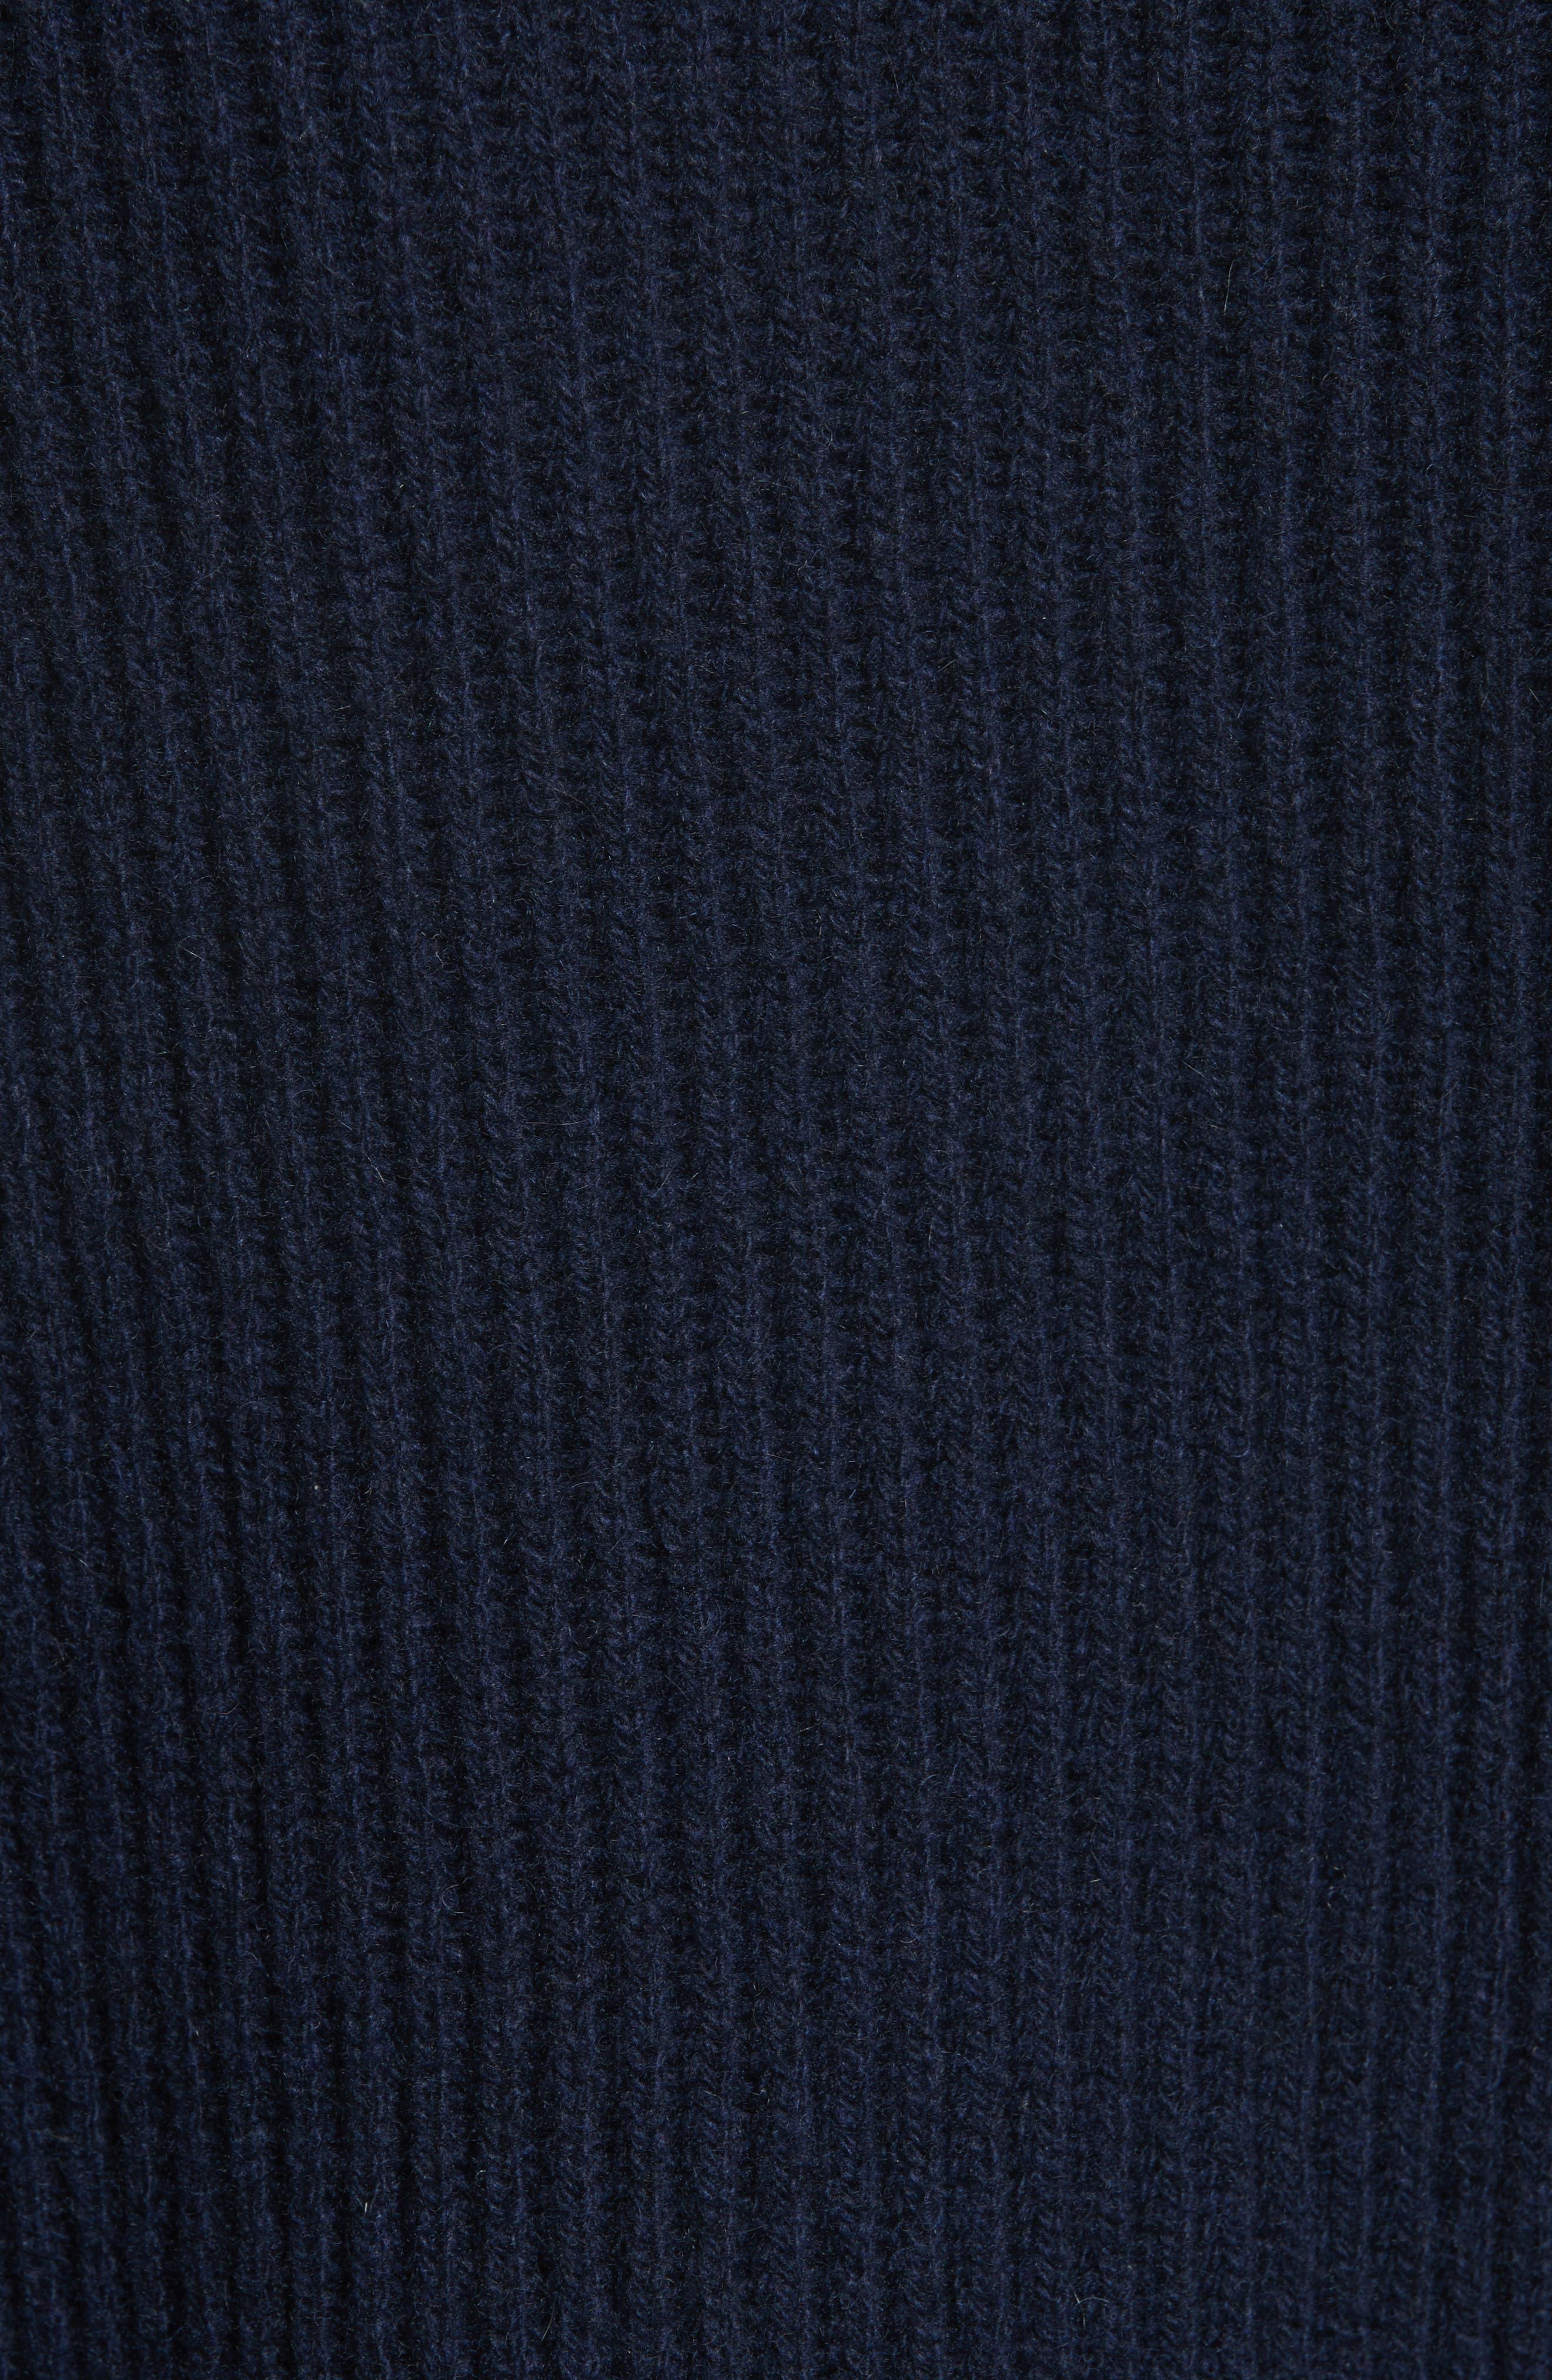 Cashmere & Wool Fringe Sweater,                             Alternate thumbnail 5, color,                             410